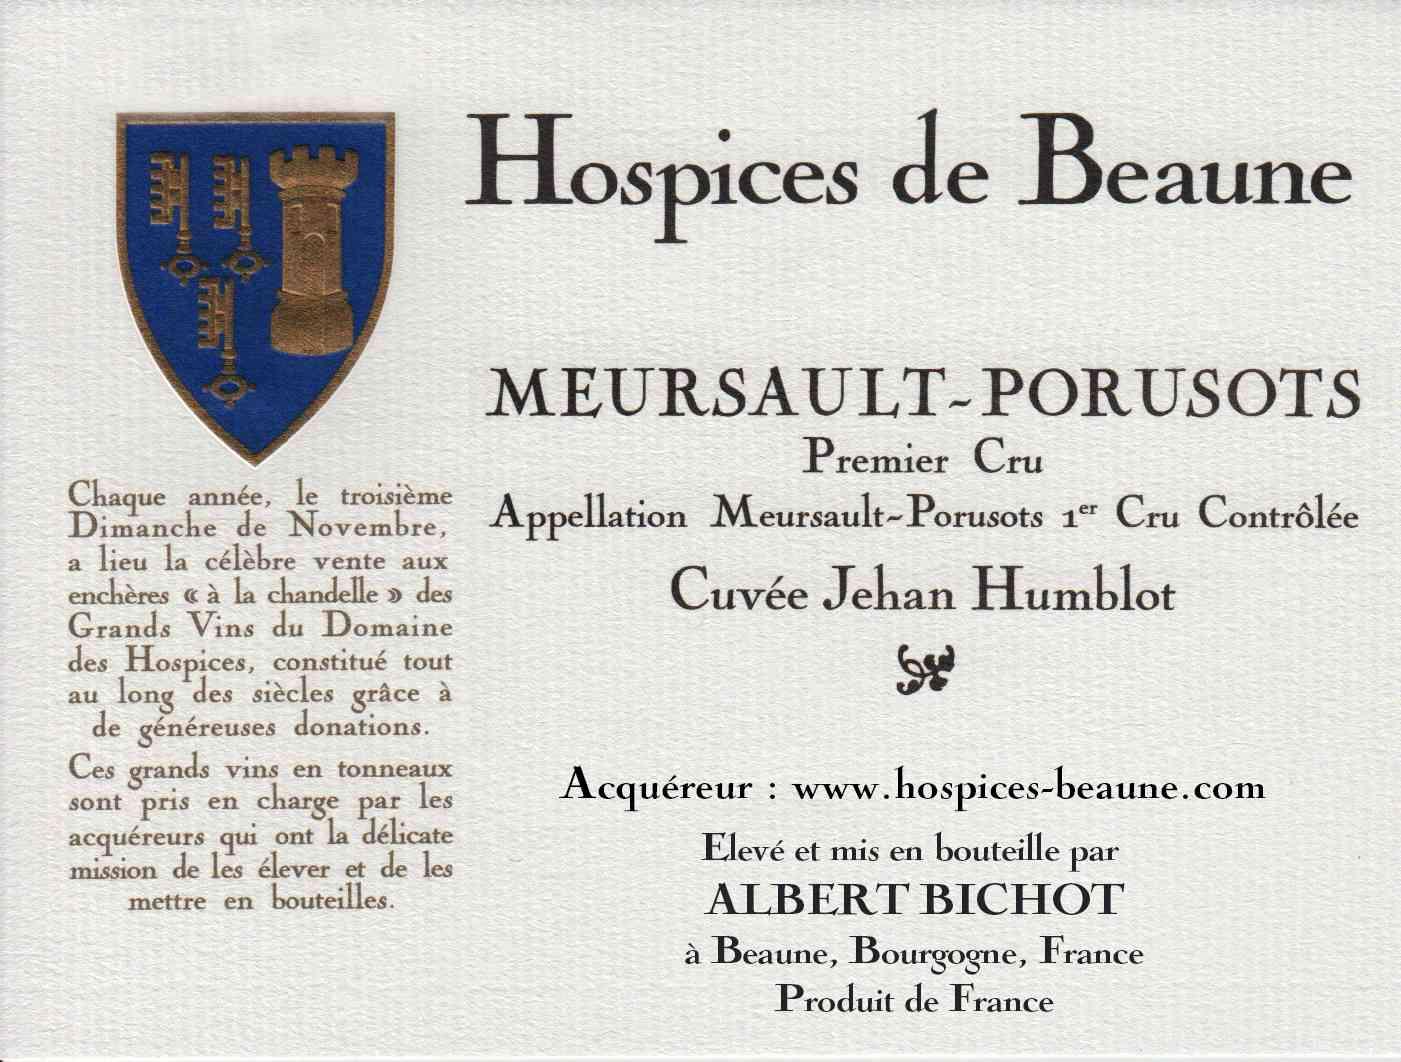 Encheres-auction-HospicesdeBeaune-AlbertBichot-Meursault-Porusots-PremierCru-Cuvee-JehanHublot